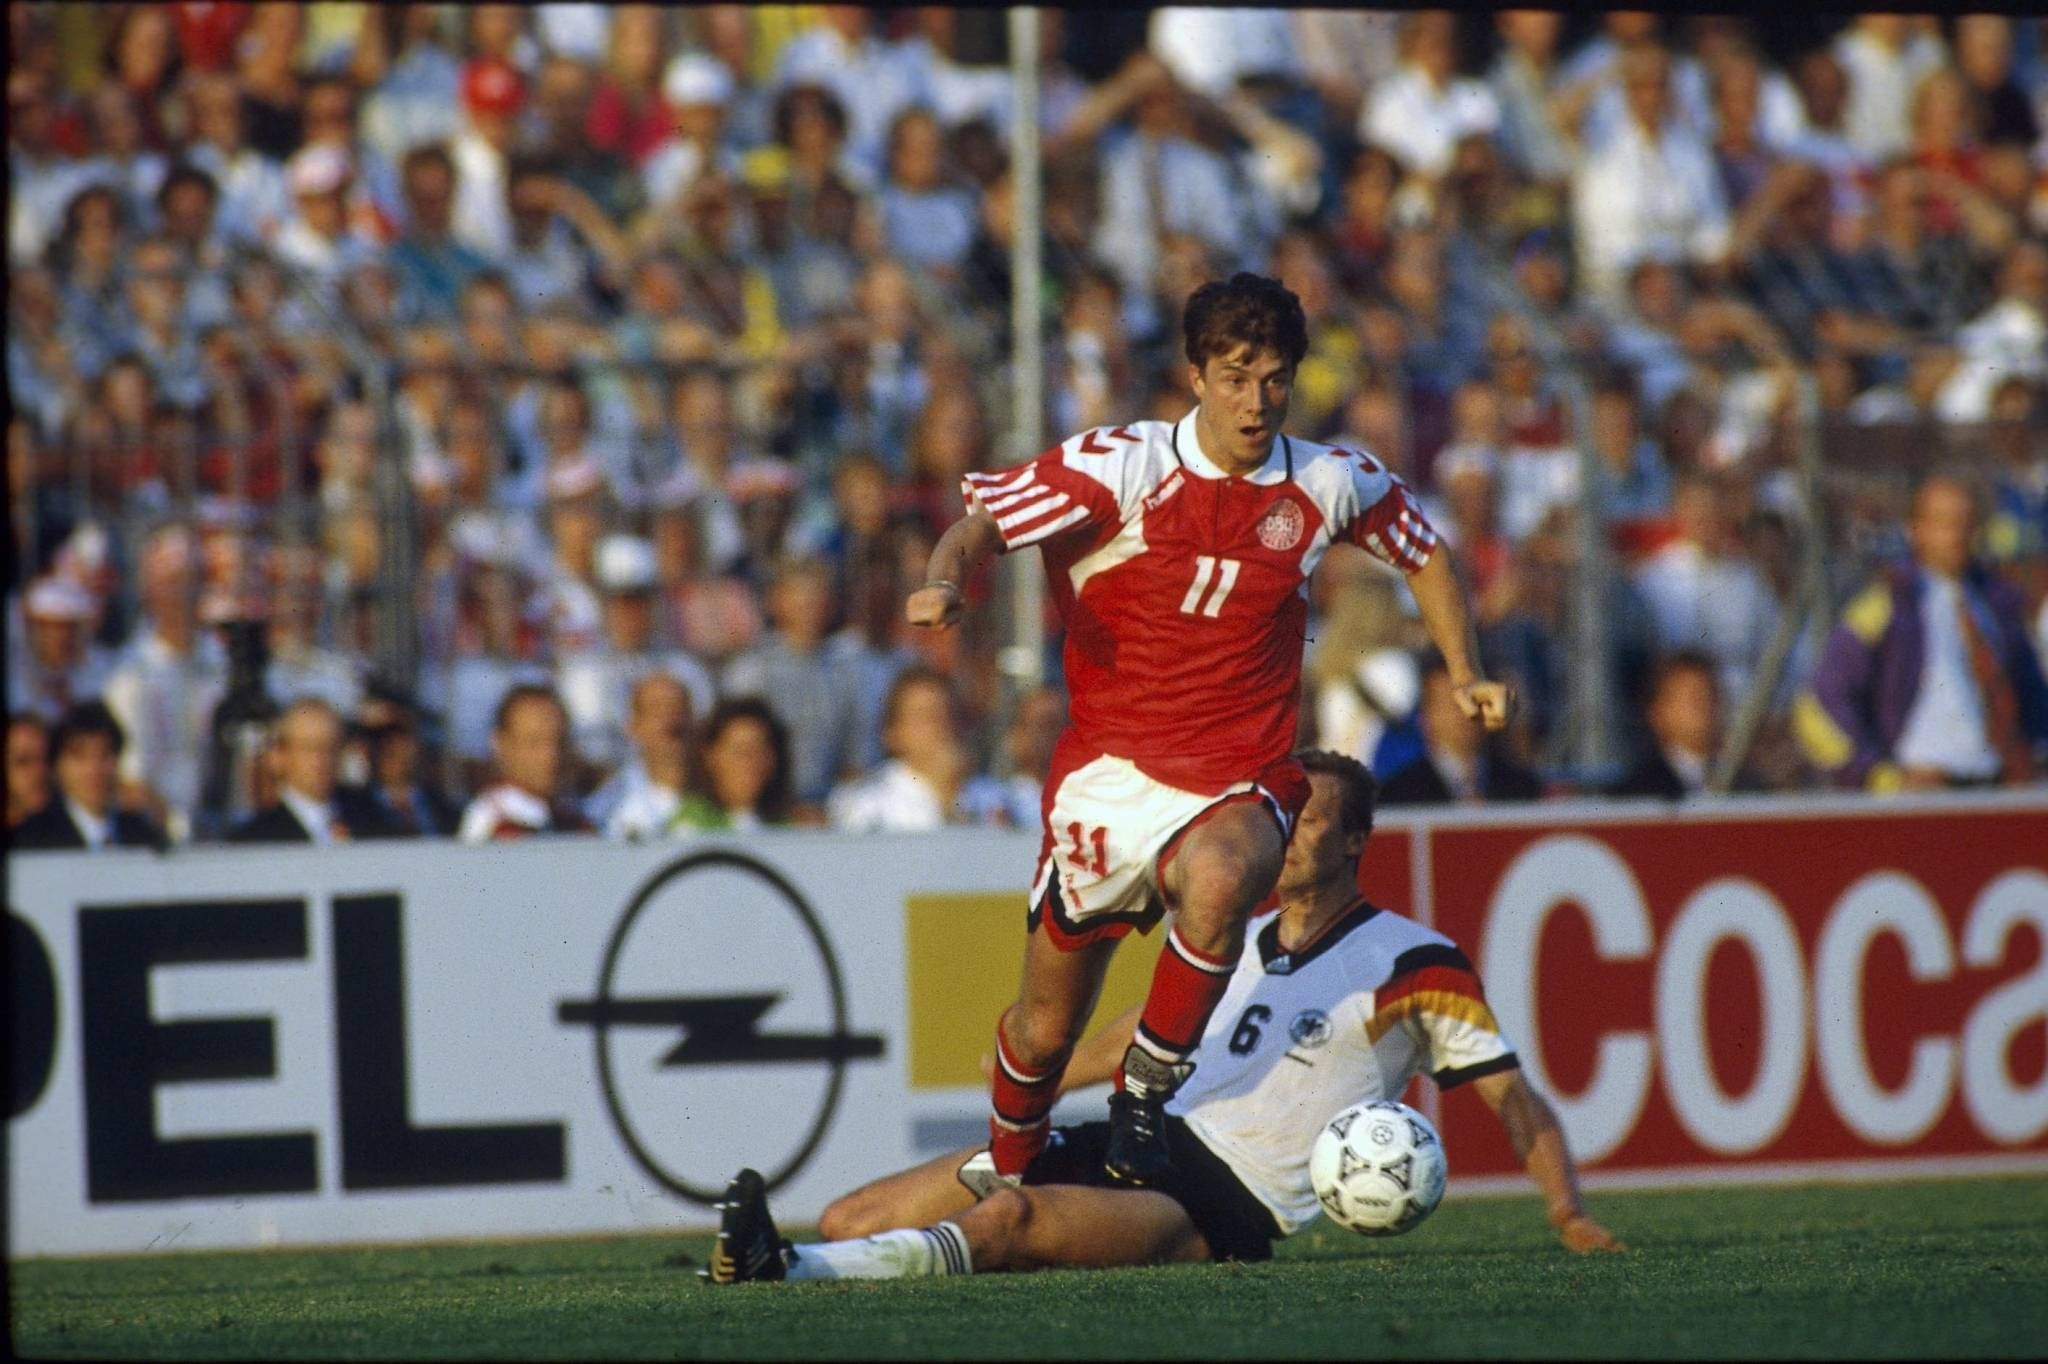 Uefa champions league 92/93 · leeds united. Brian Laudrup | Brian laudrup, Sports, Stationary bike